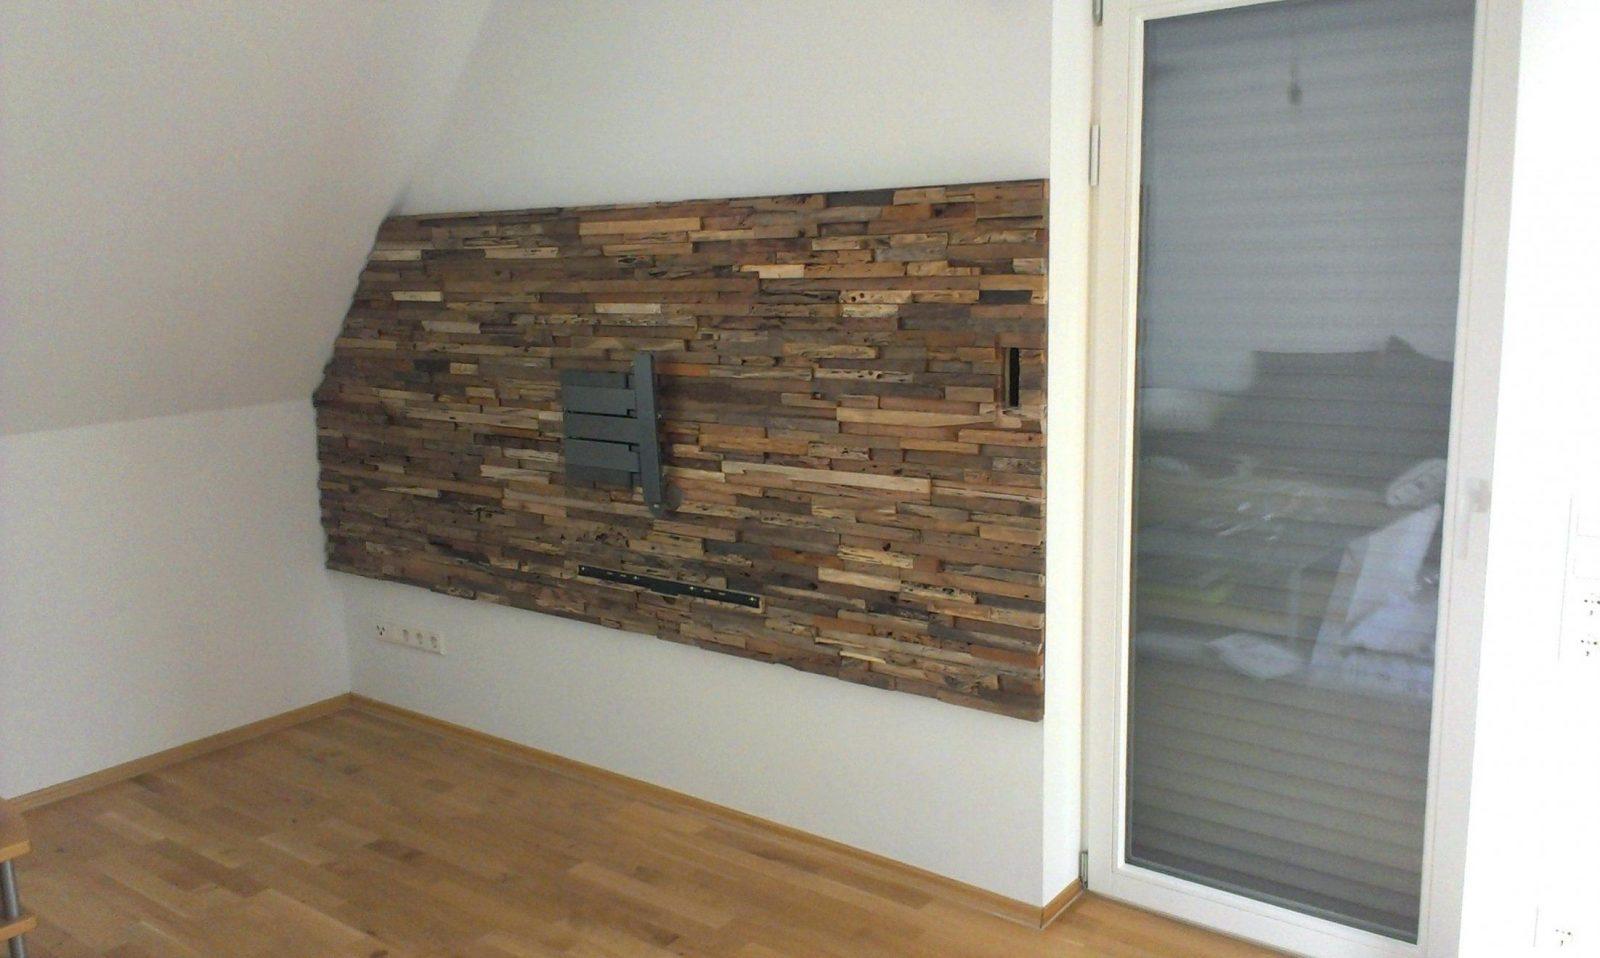 Wandverkleidung Holz Selber Bauen Wandverkleidungen Granit Von  Wandvertäfelung Holz Selber Machen Photo ...